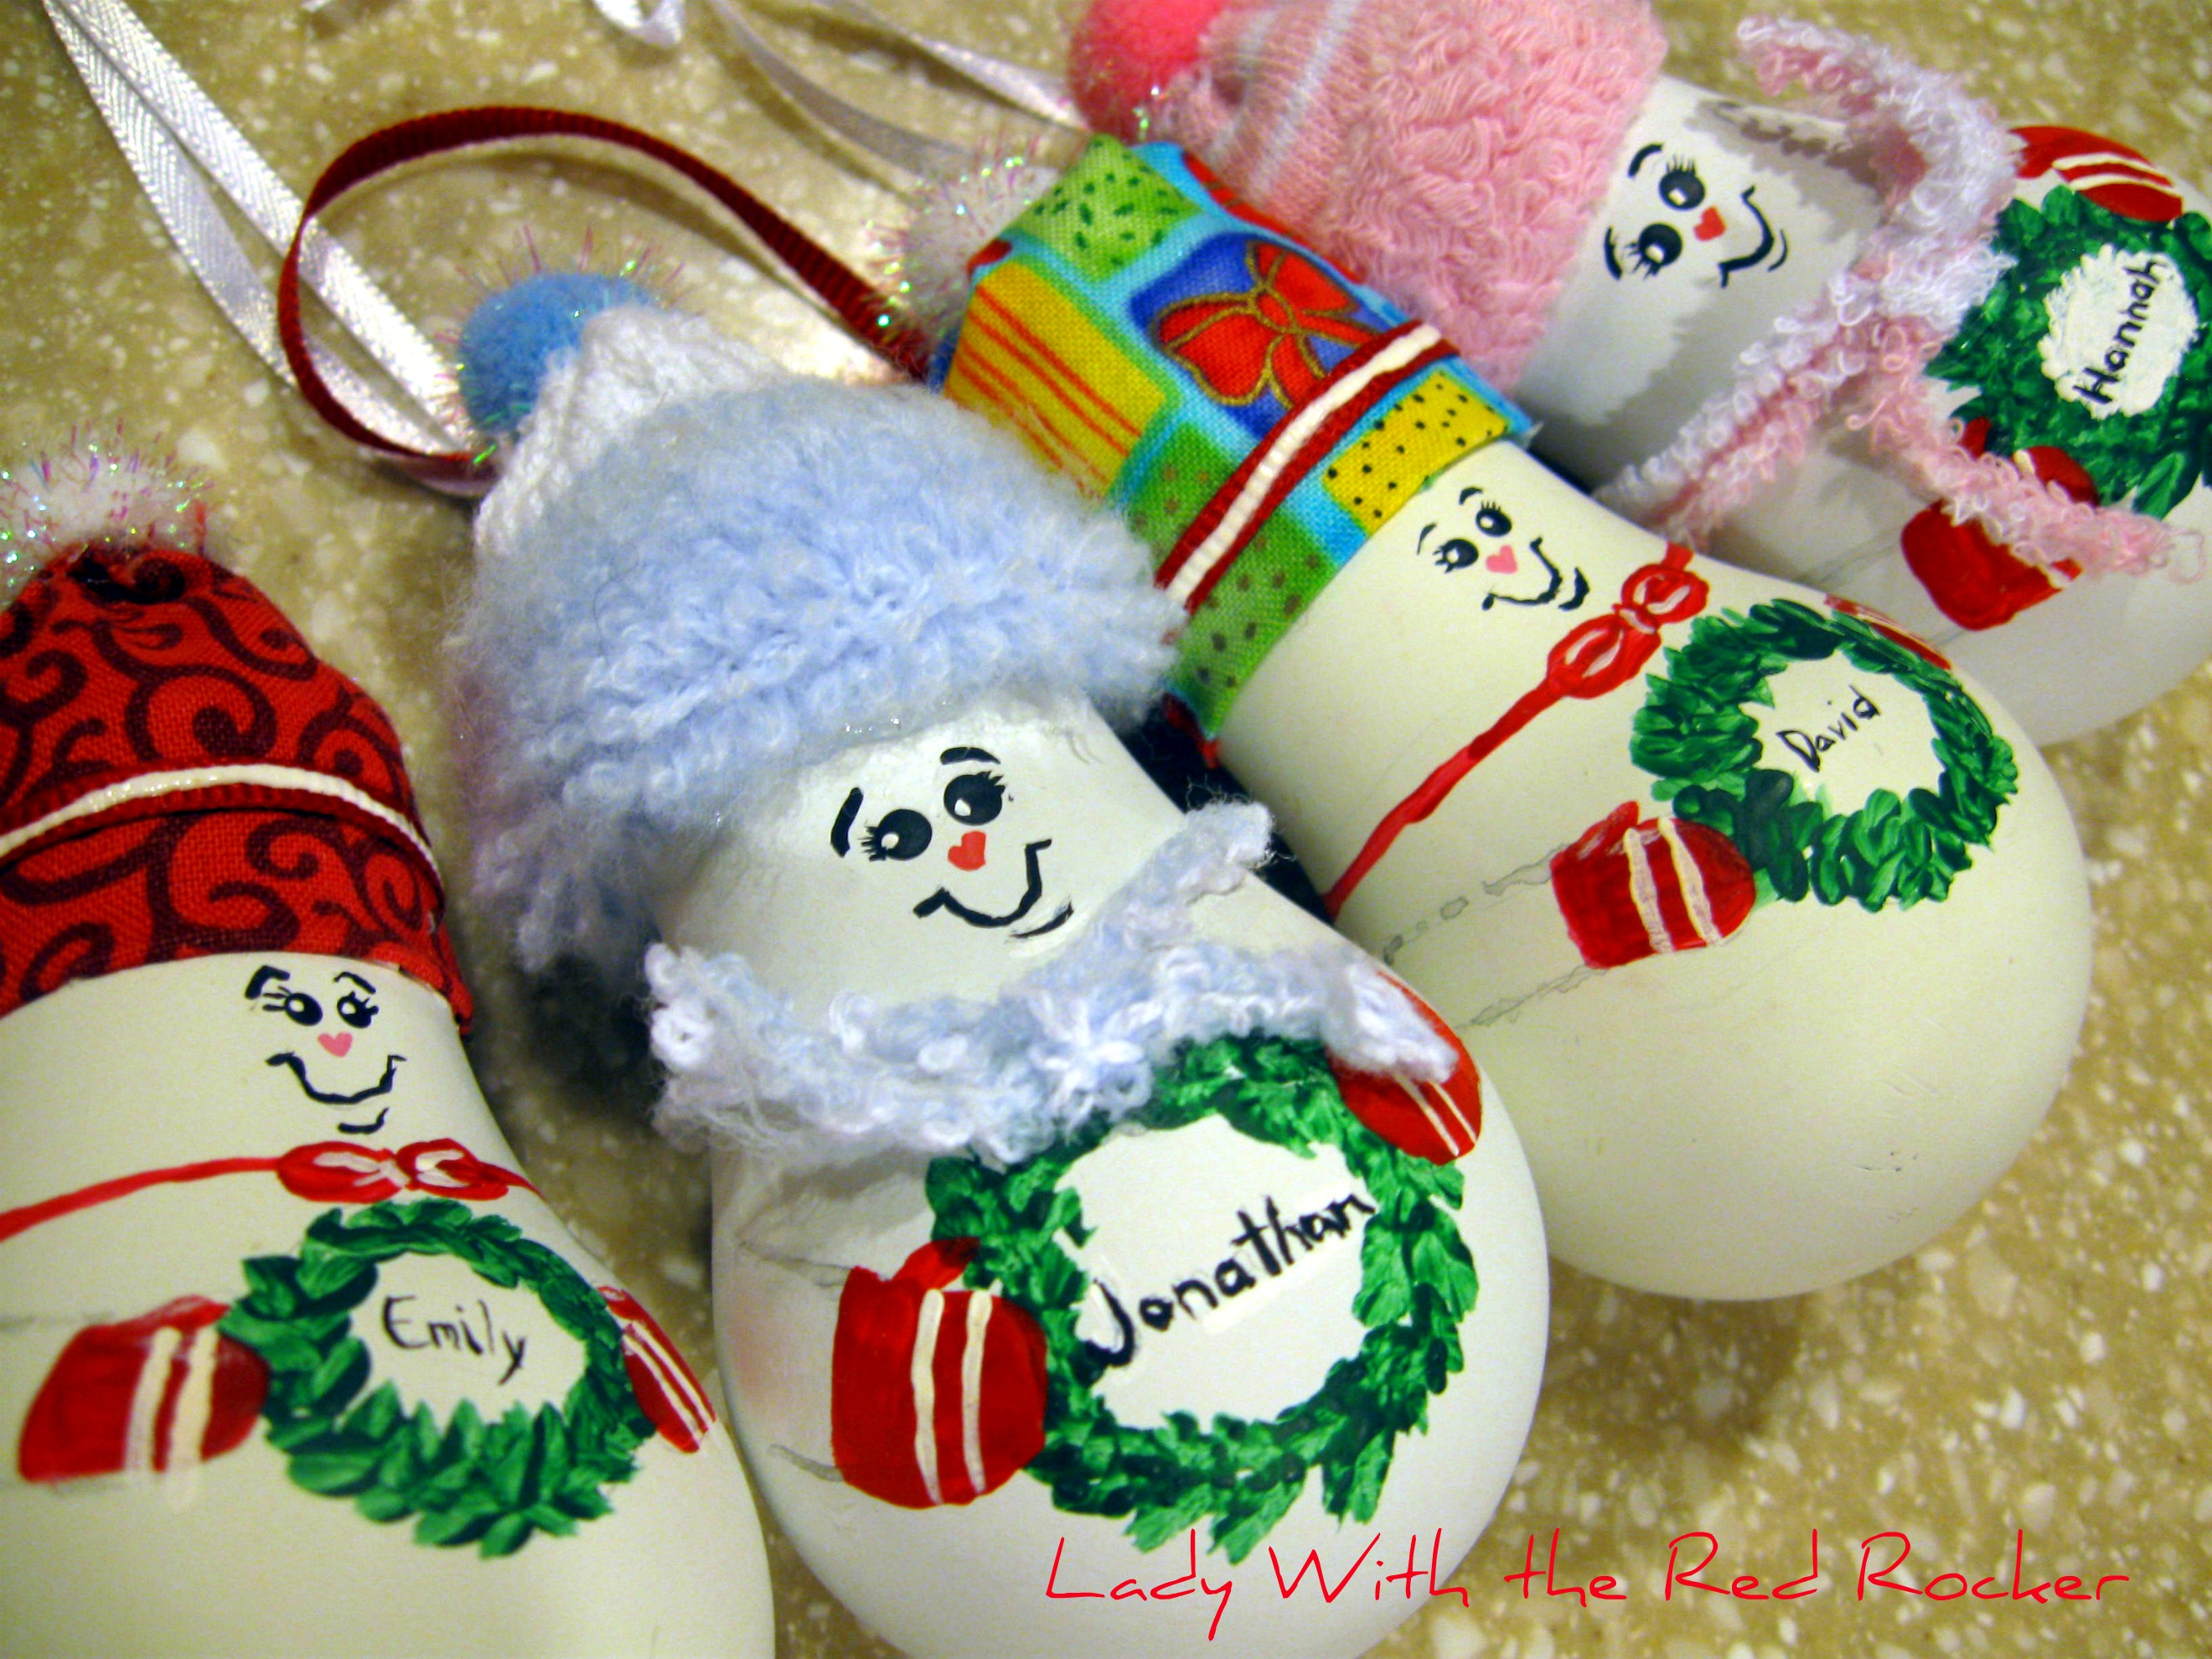 Light bulb ornaments - I